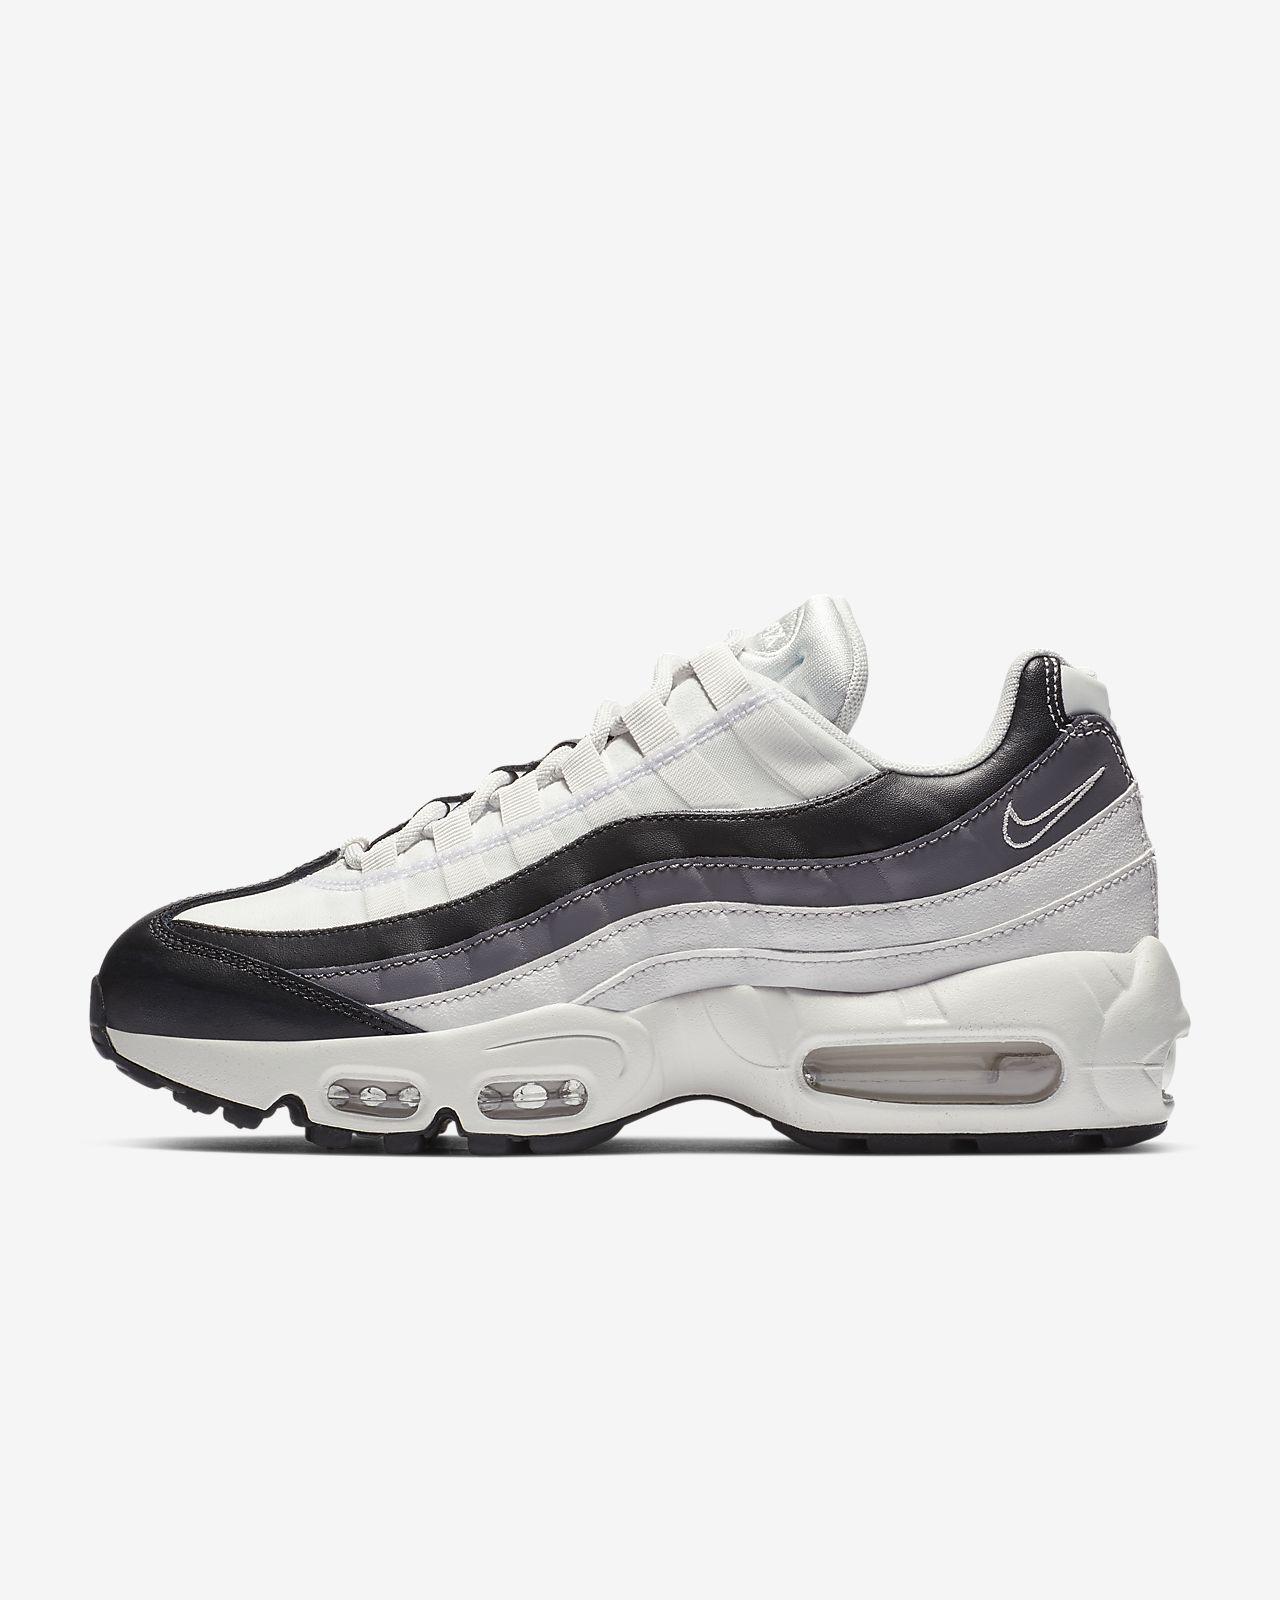 more photos 92c44 b2265 ... Nike Air Max 95-sko til kvinder